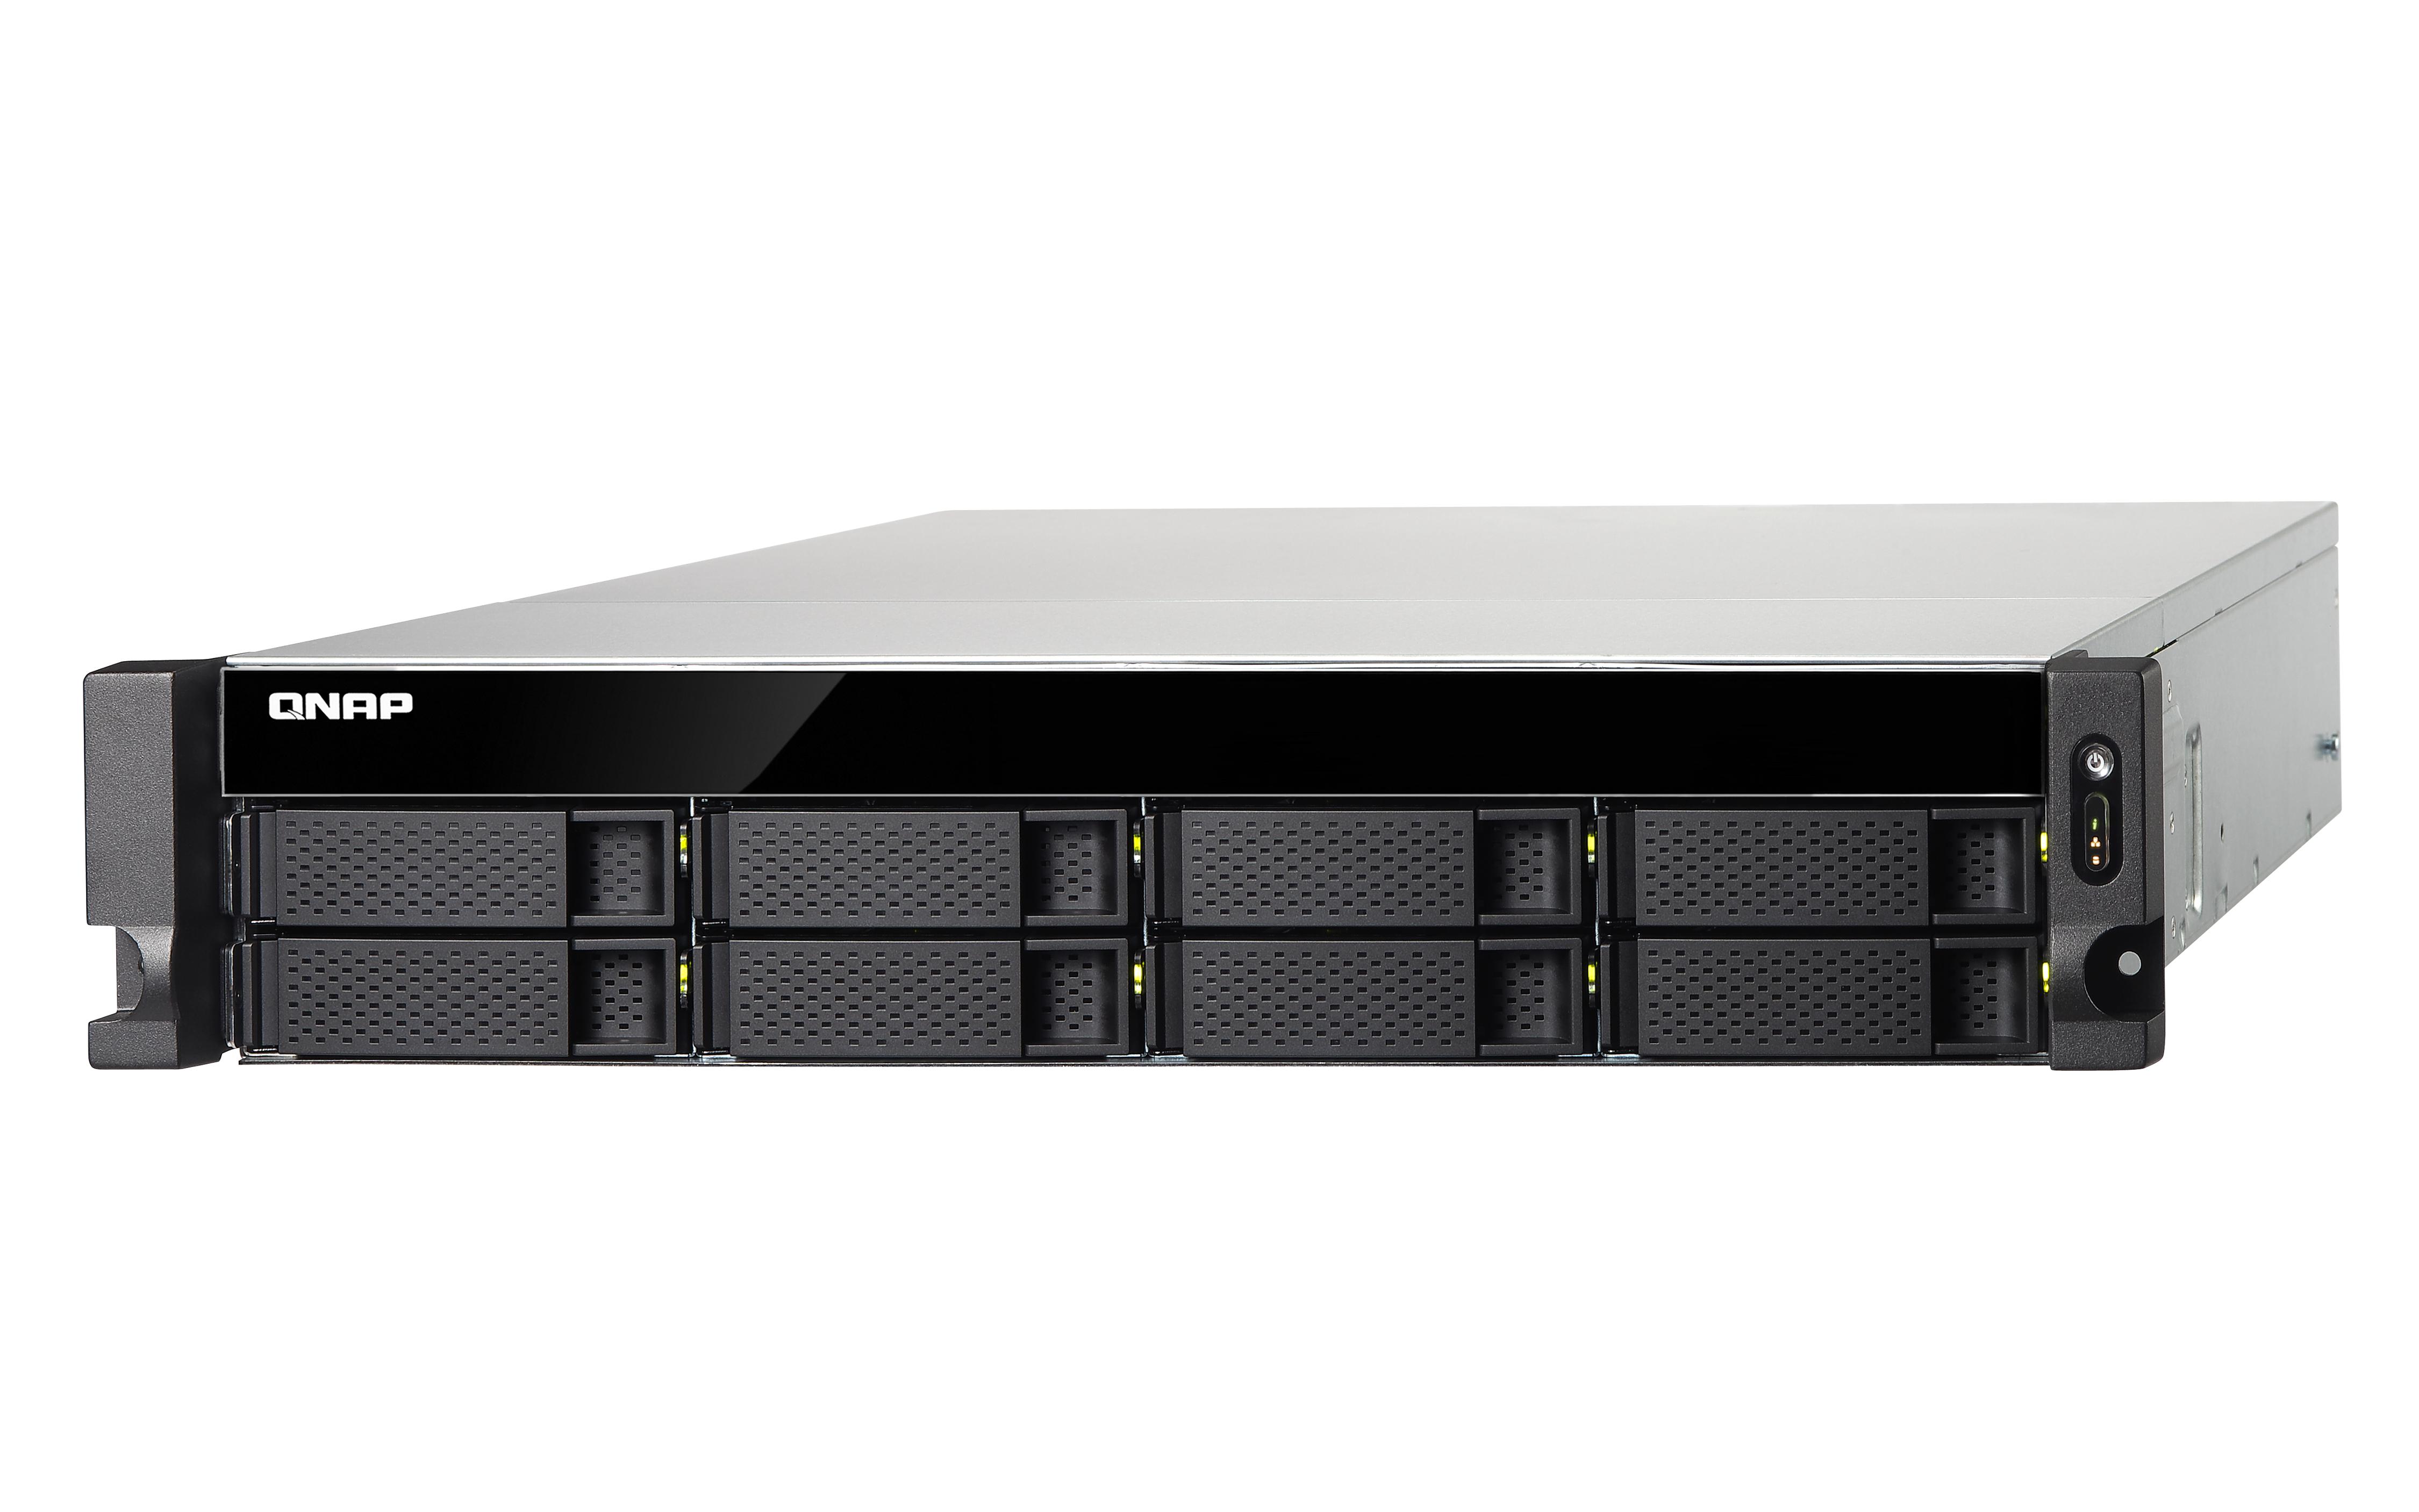 QNAP TS-853BU NAS Armadio (2U) Collegamento ethernet LAN Nero 4713213511541 TS-853BU-4G 10_Y992932